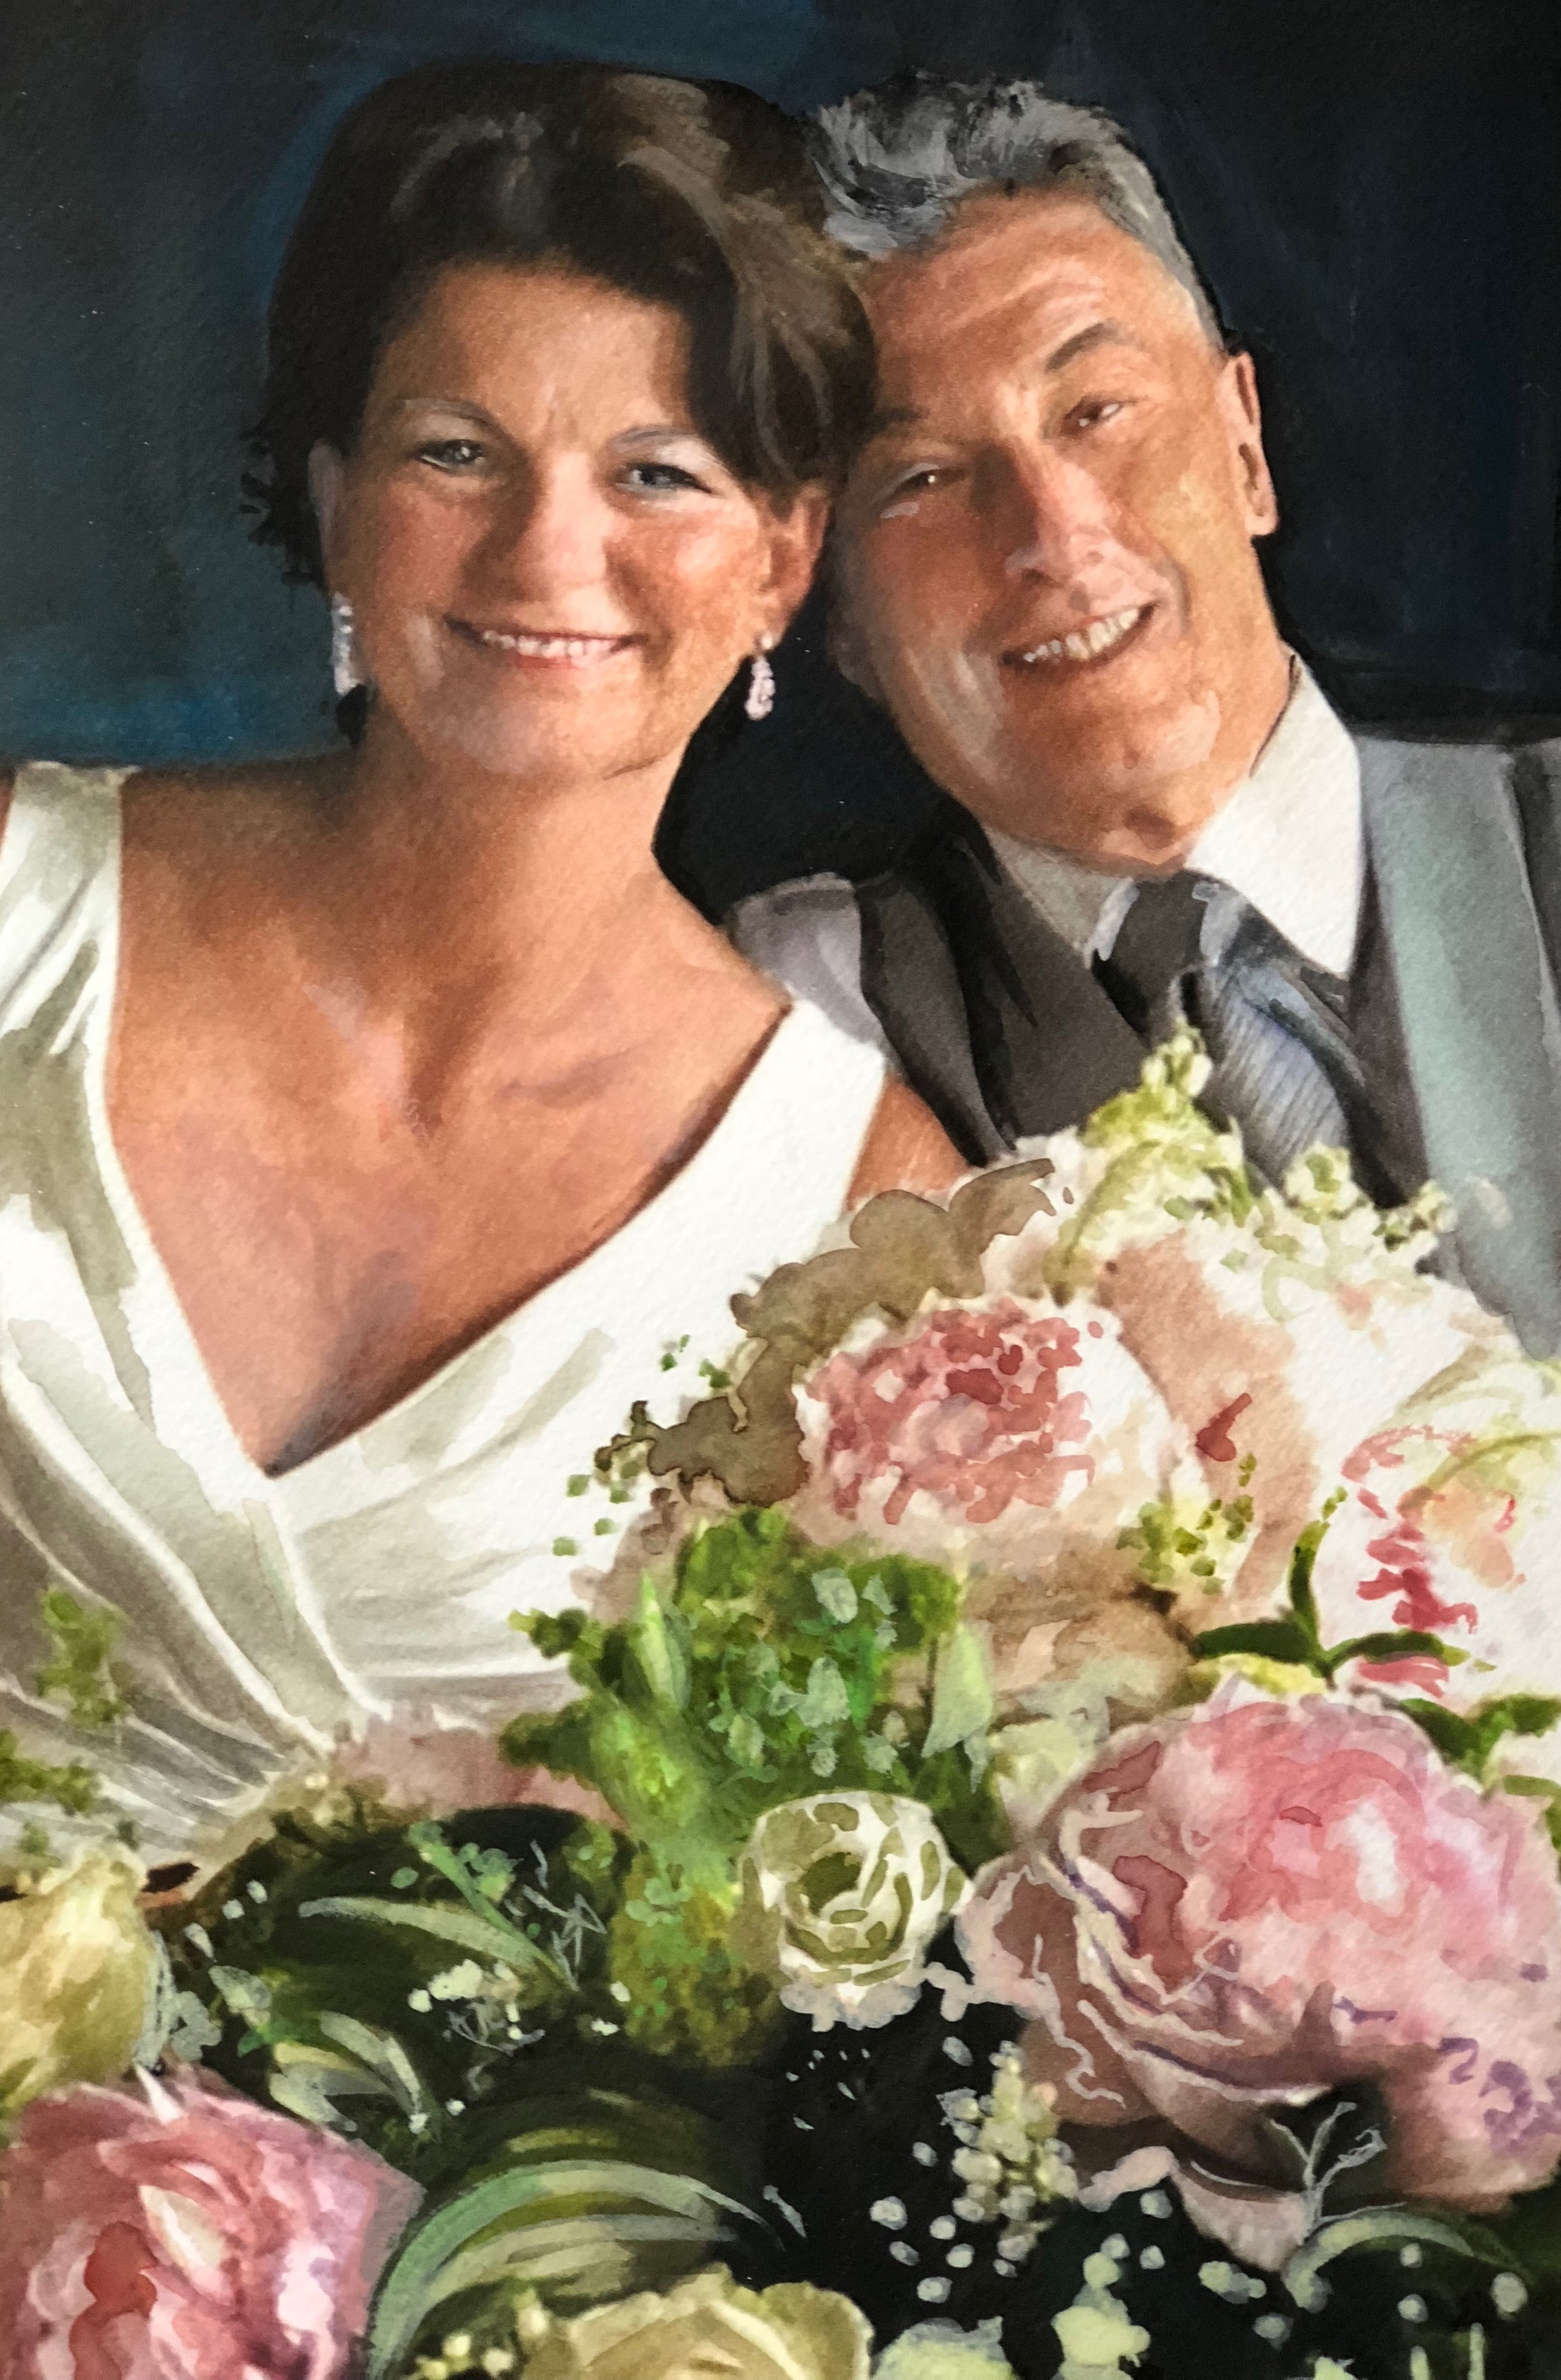 Wedding Day celebrations...